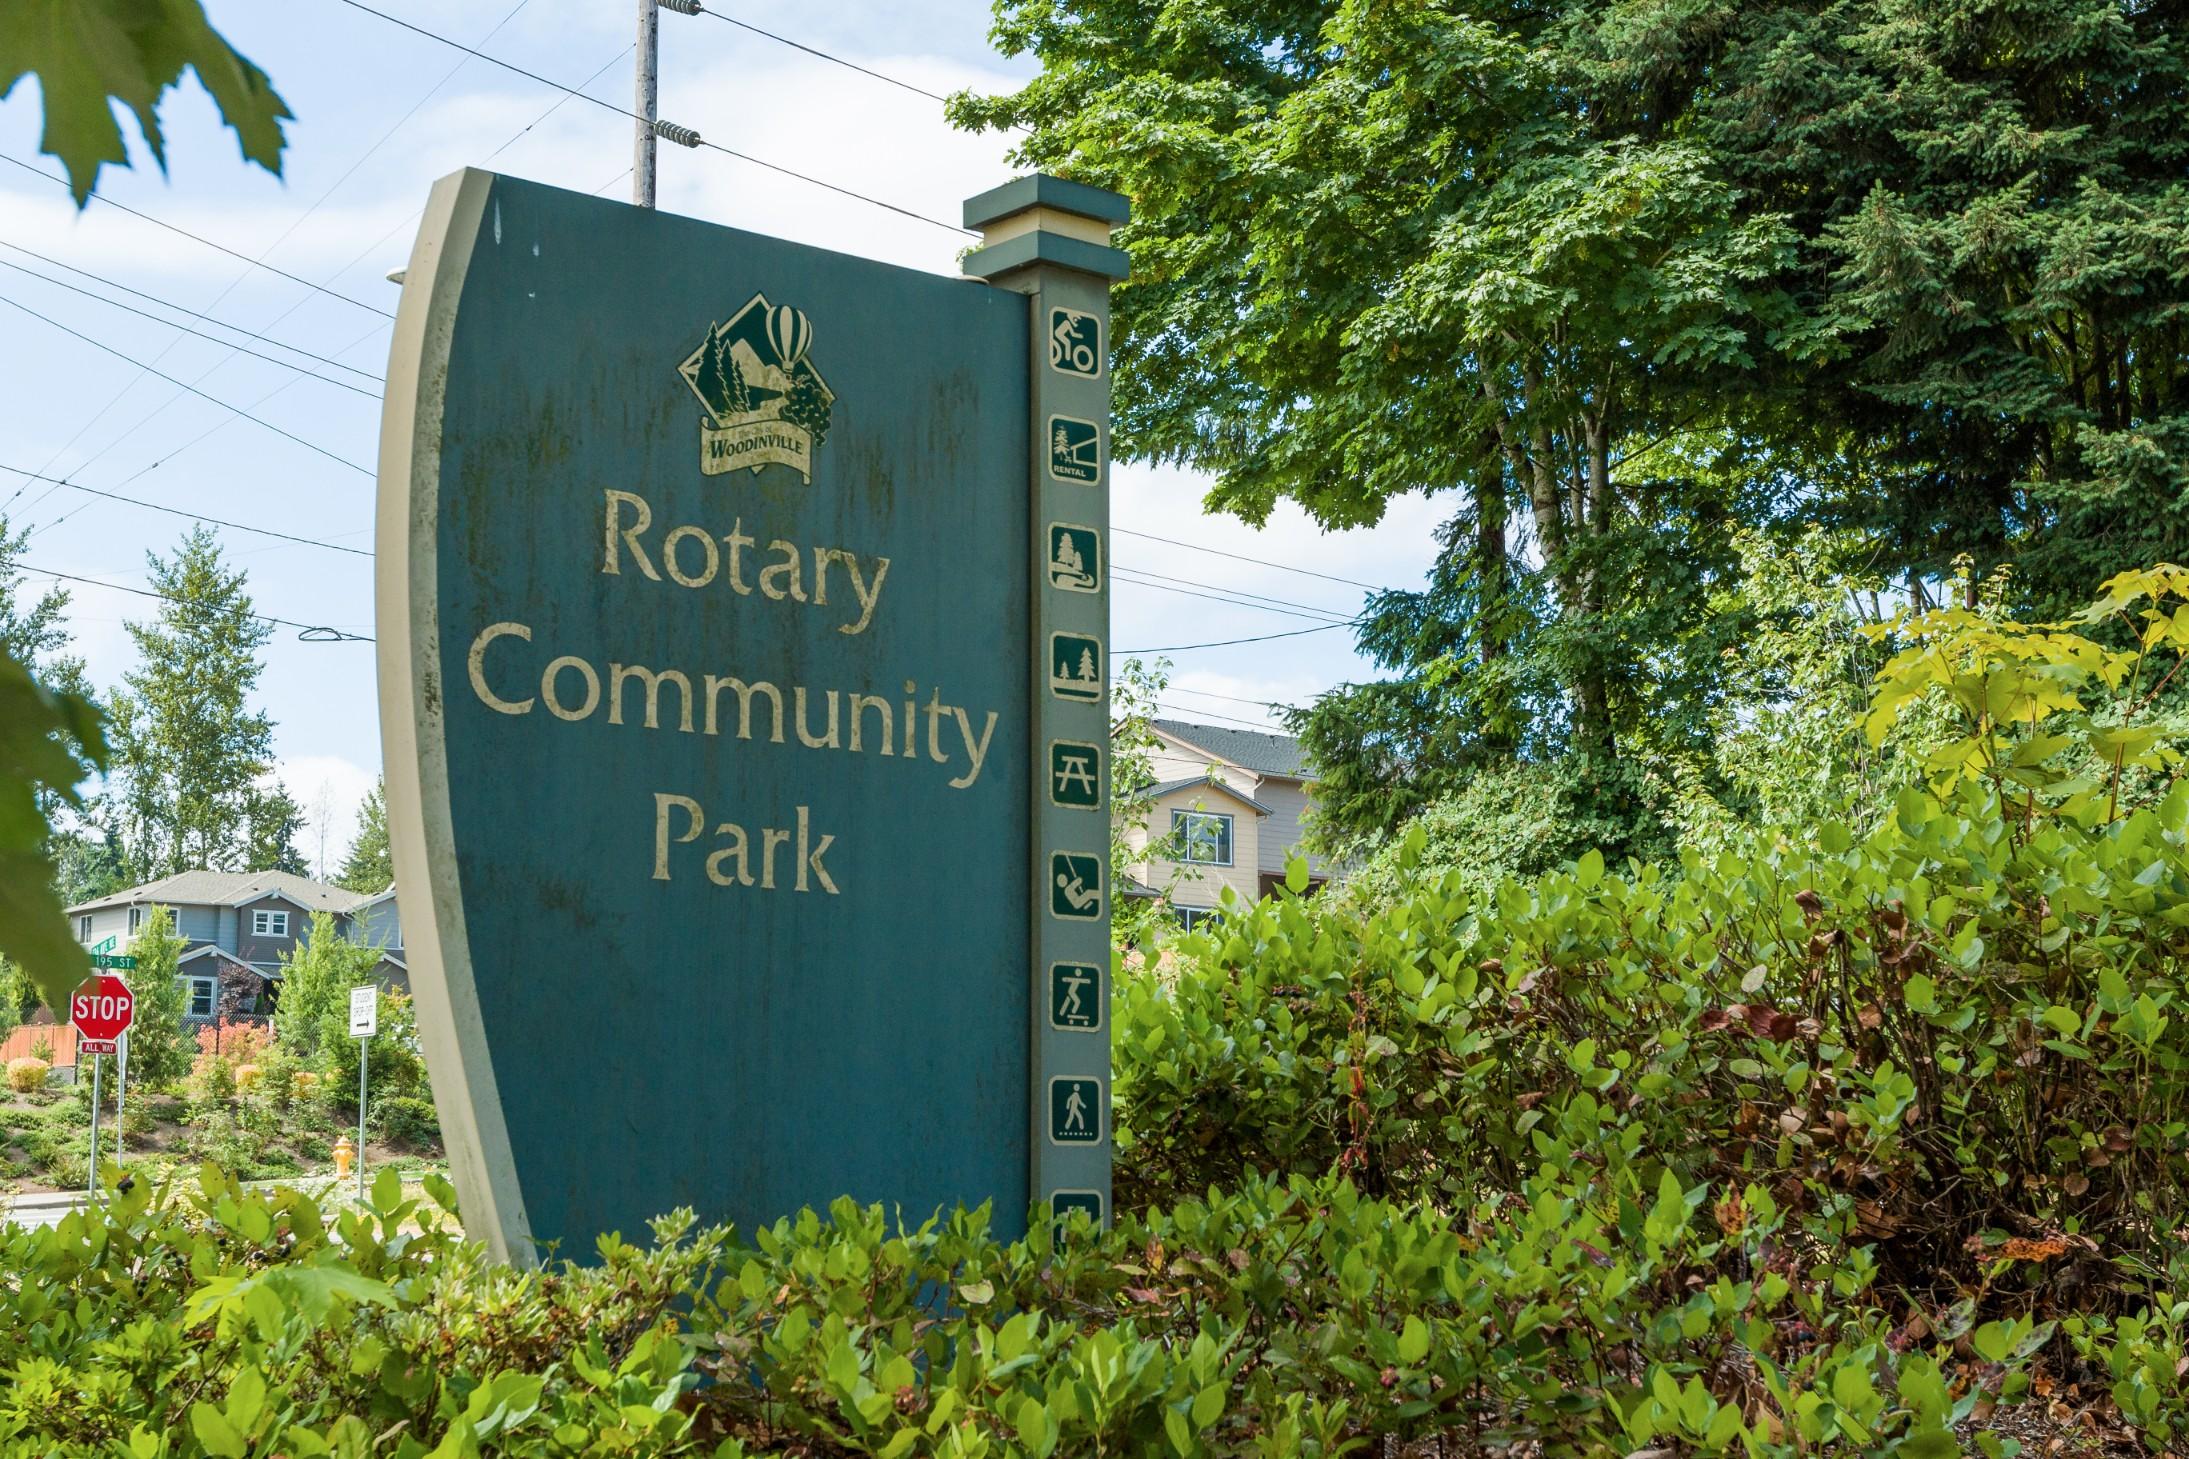 WindermereNorth_Woodinville_RotaryCommunityPark.jpg